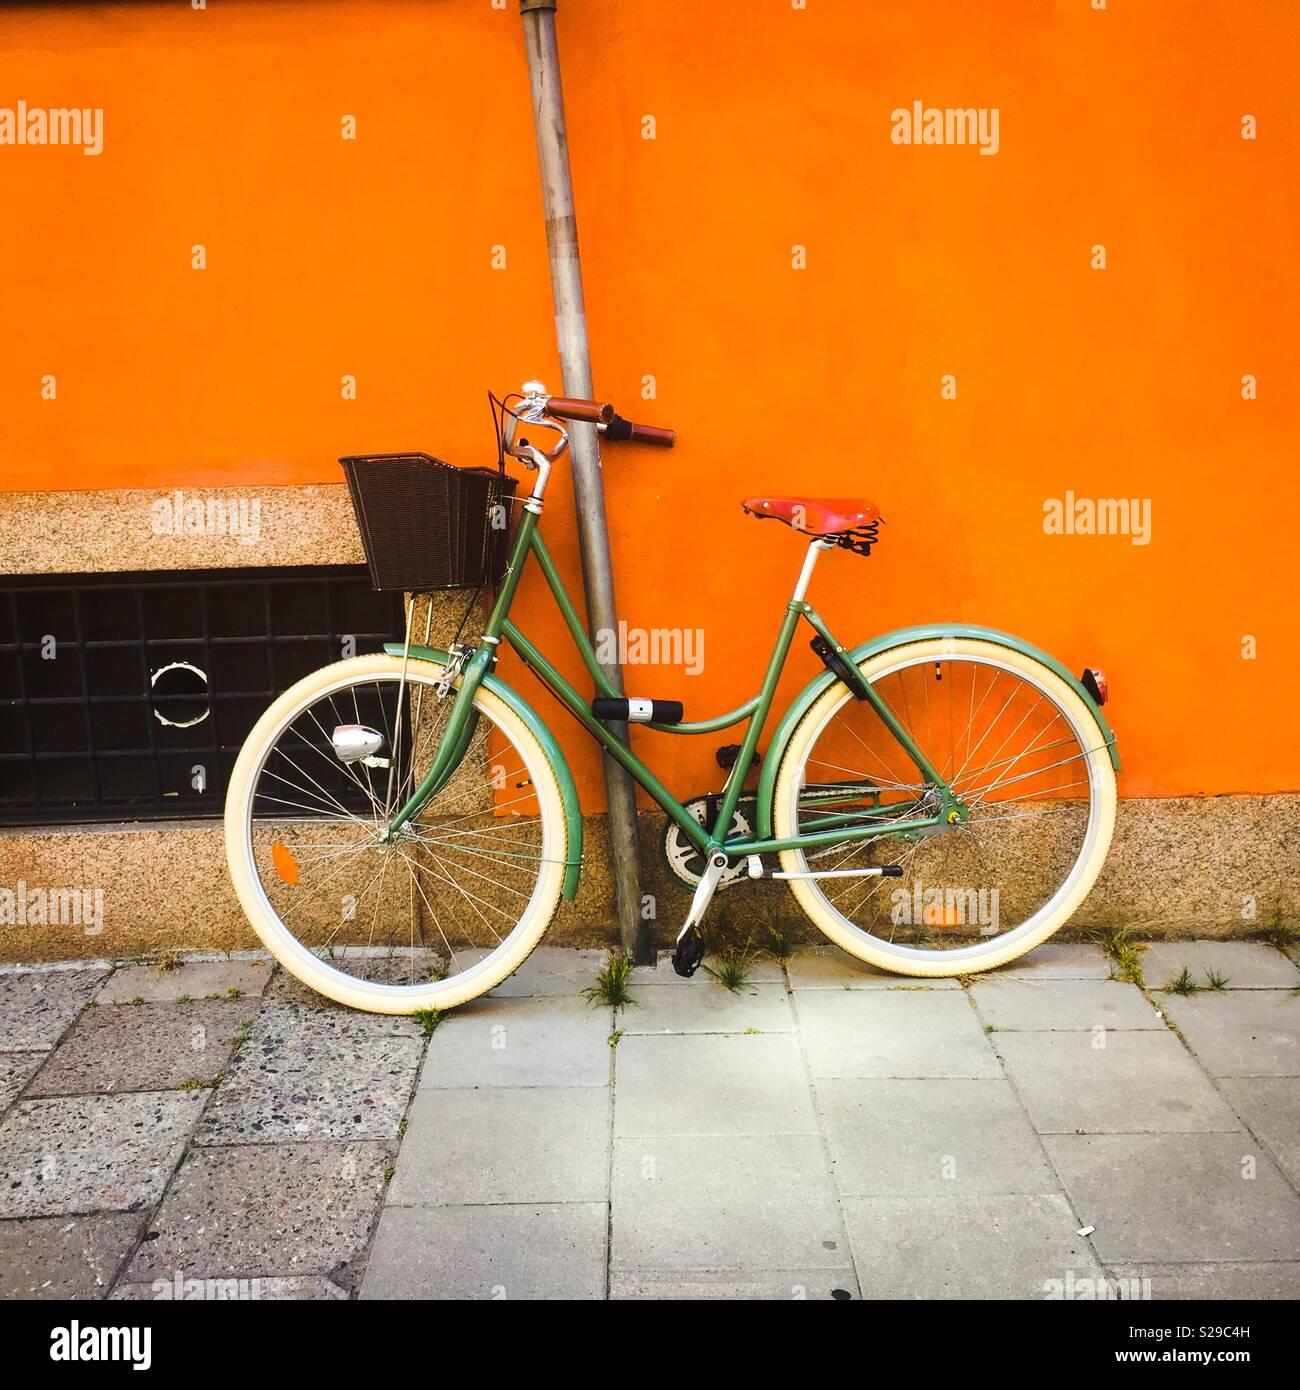 Grüne Fahrrad lehnte sich gegen orange Wand Stockbild